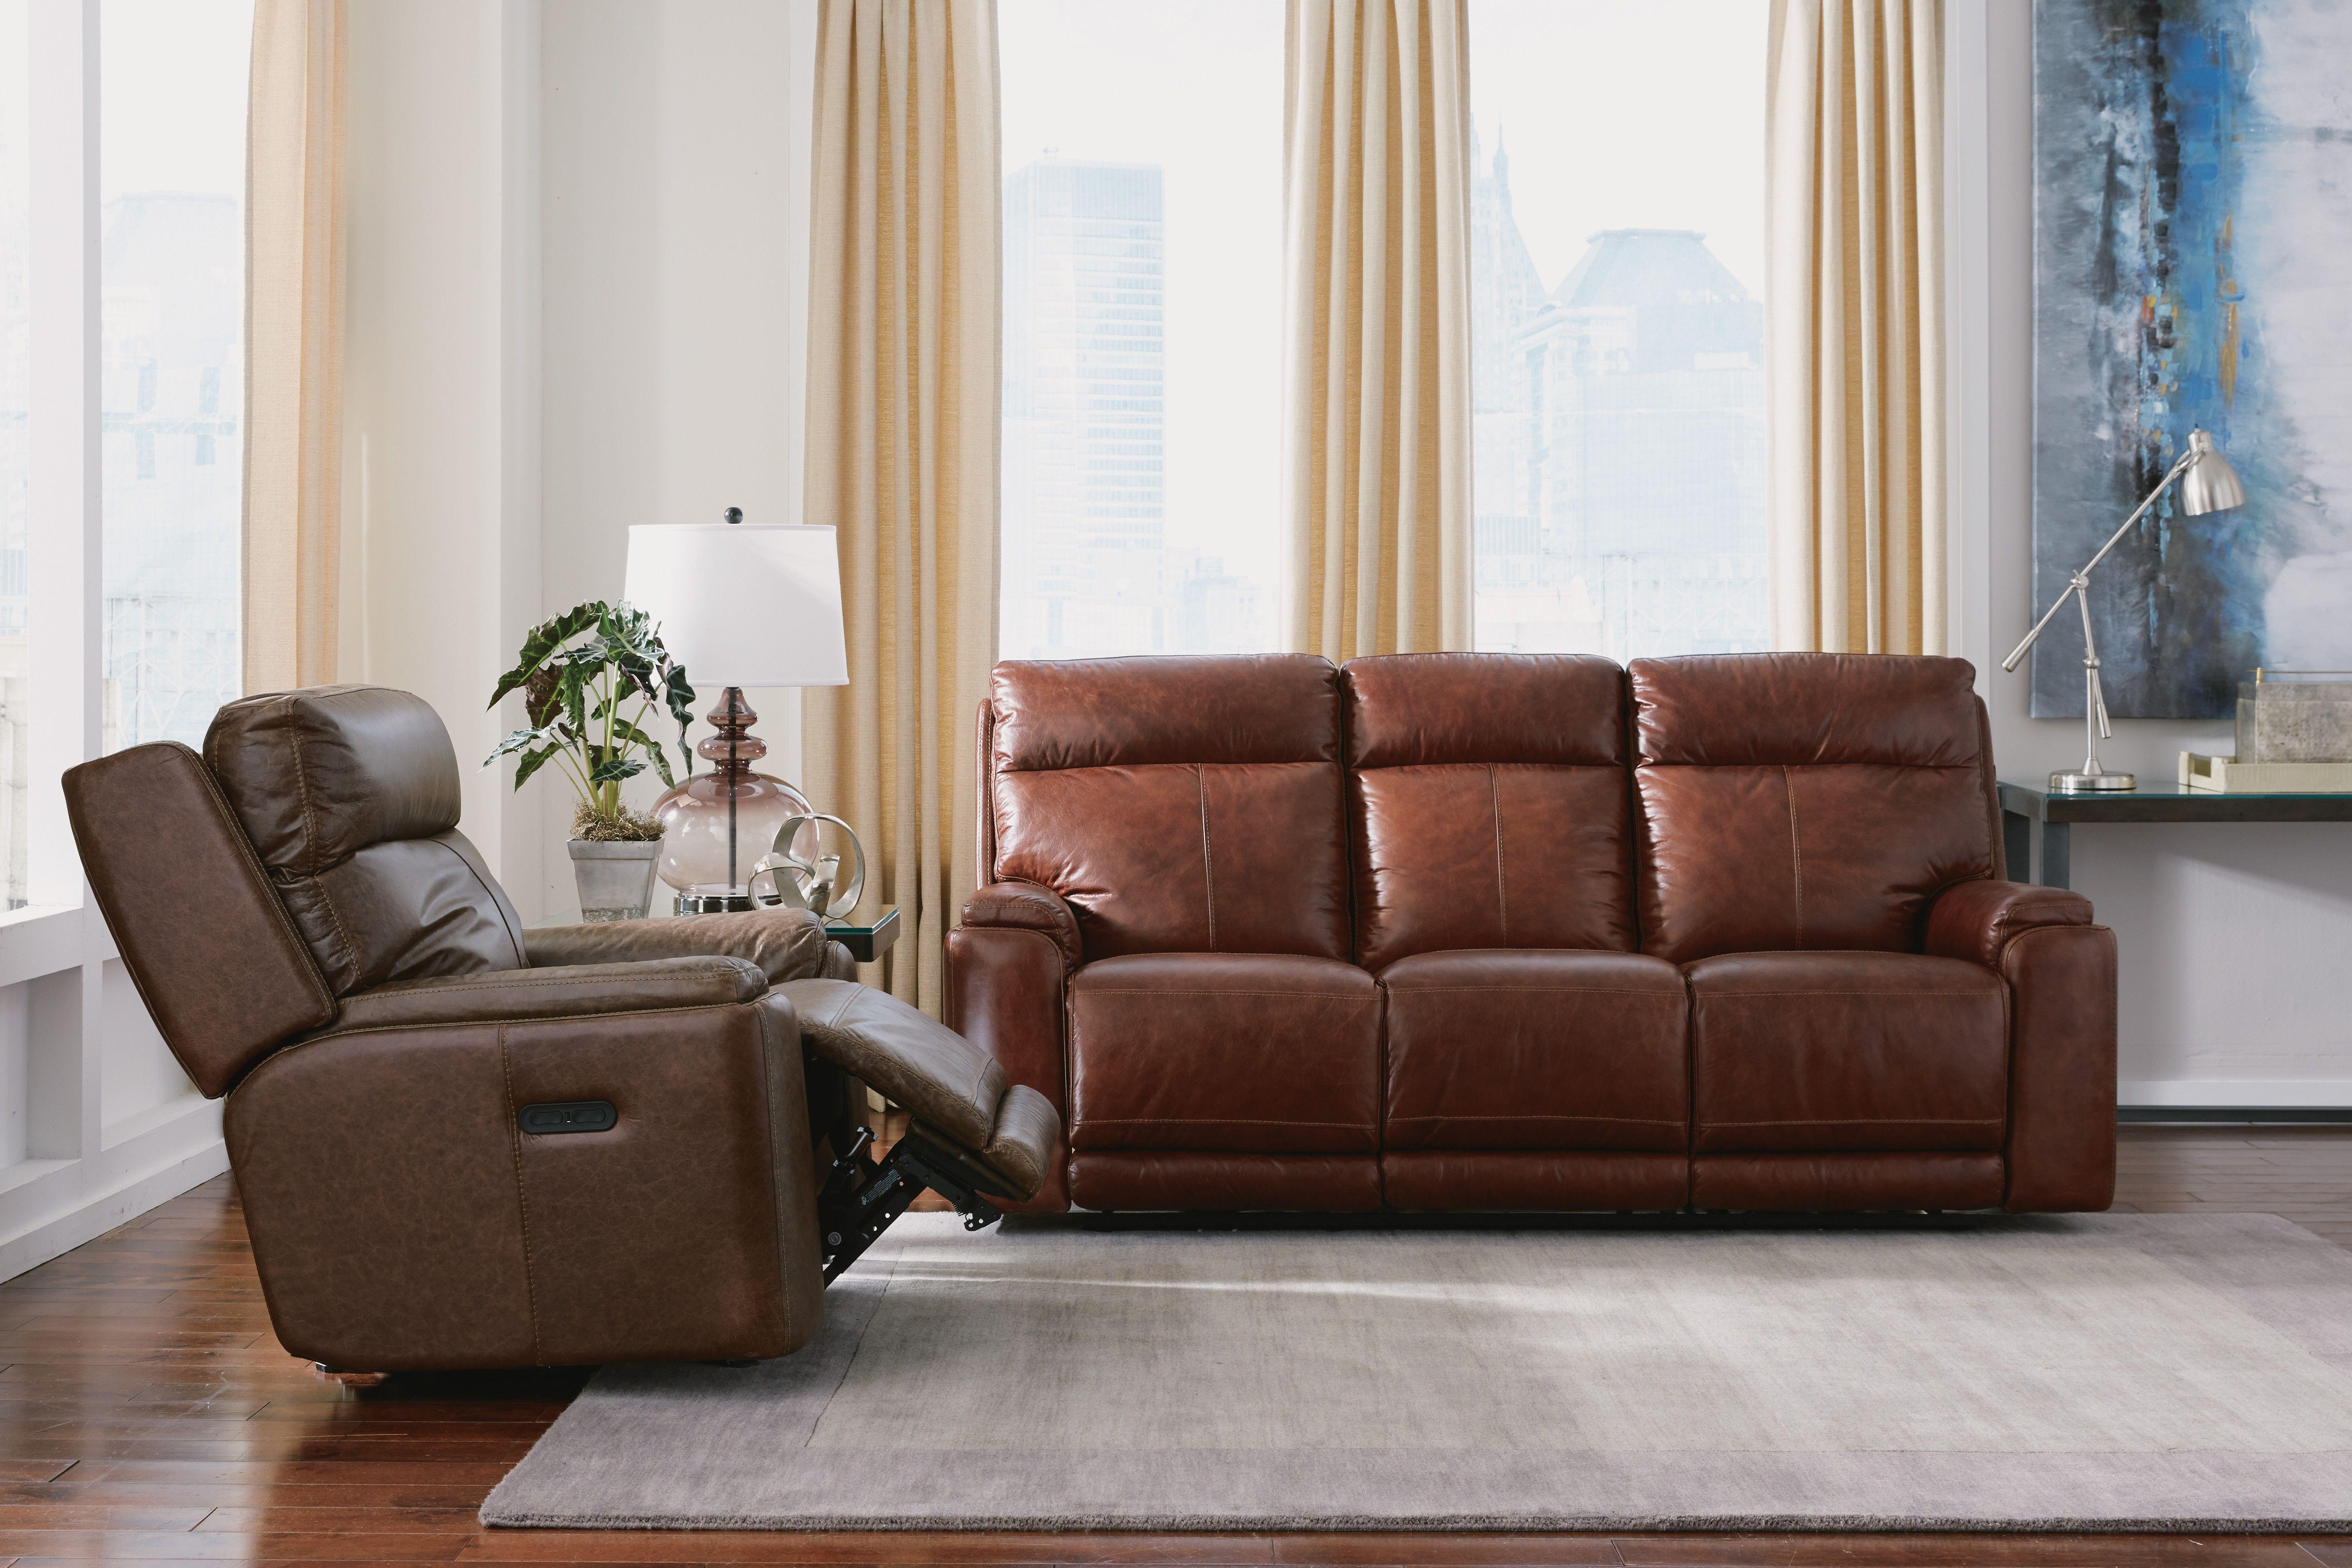 Wohnzimmer Moebel Grau Sofa Moderne Leder Sofa Sofa Preis Grau